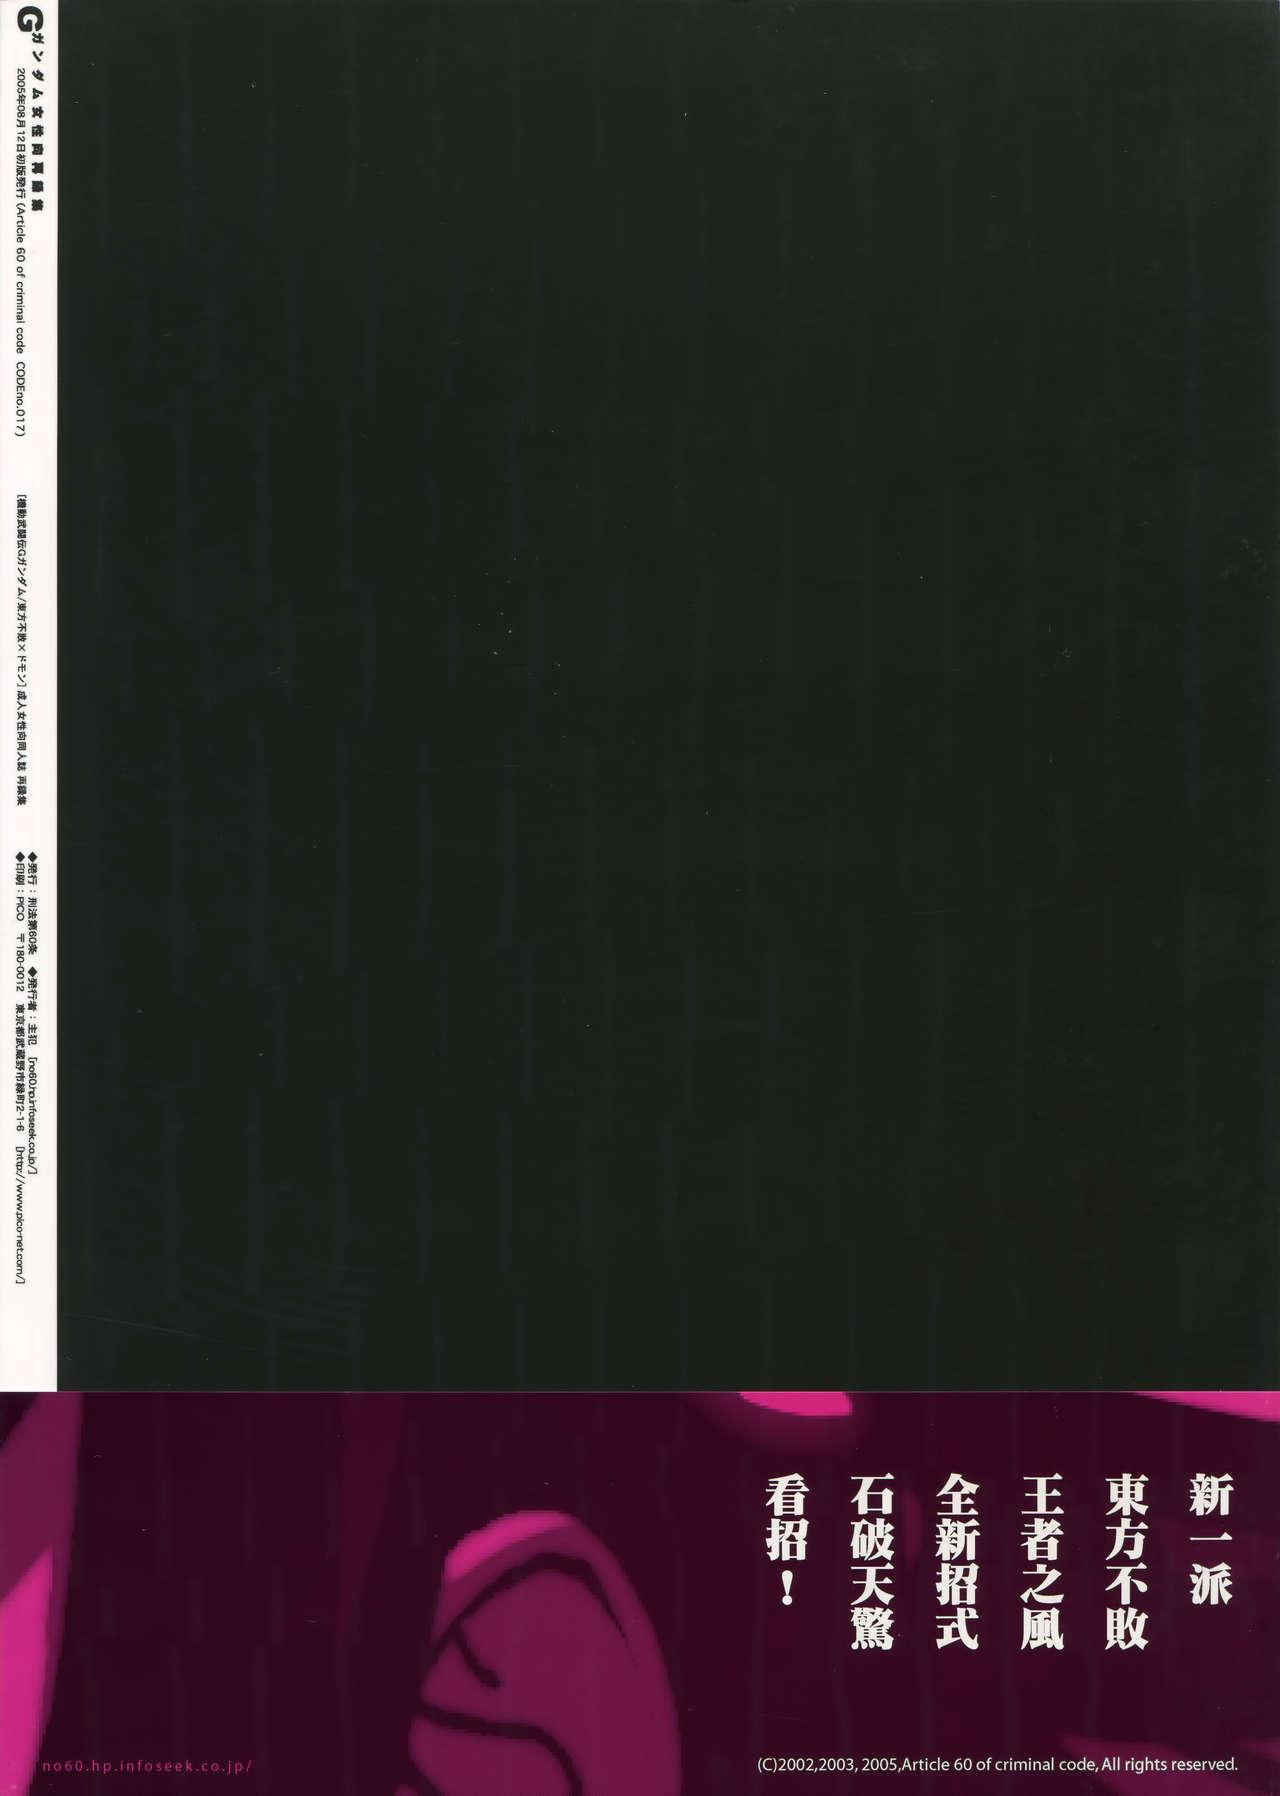 [Article 60 of Criminal Code (Shuhan)] G-gan Josei-Muke Sairoku-Shuu (G Gundam) 75